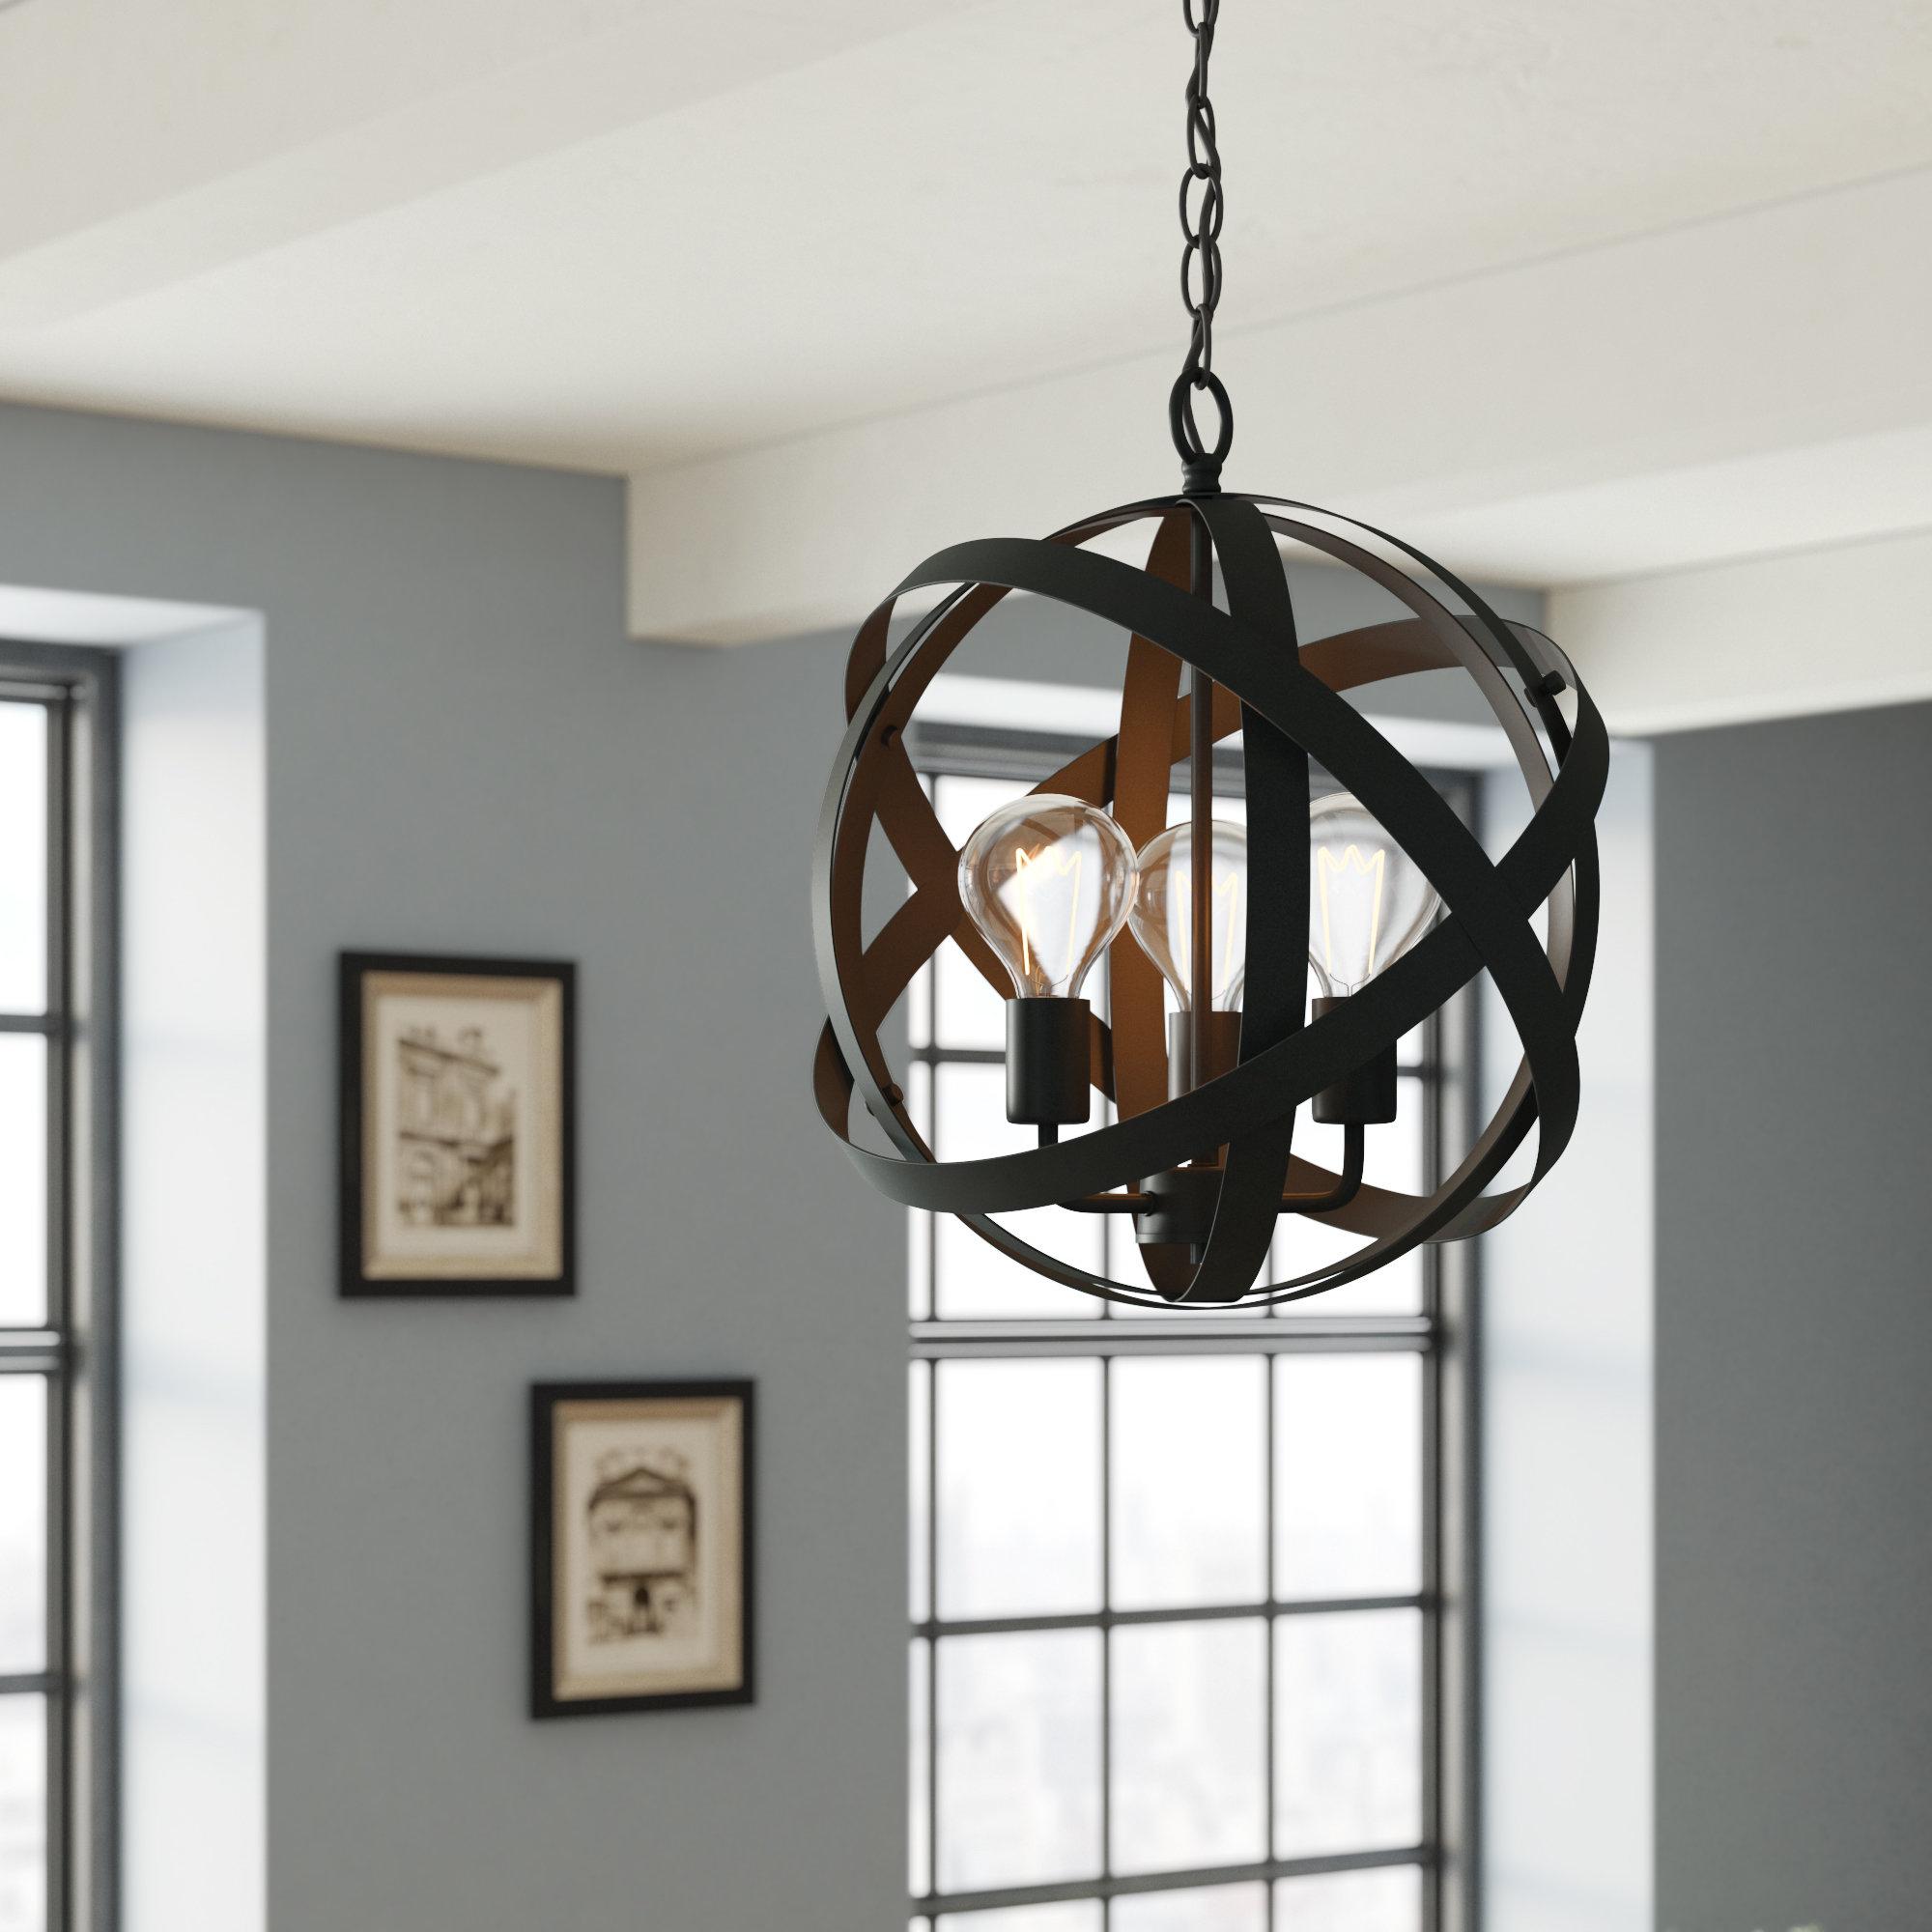 Framlingham 3-Light Globe Chandelier for Annuziata 3-Light Unique/statement Chandeliers (Image 15 of 30)